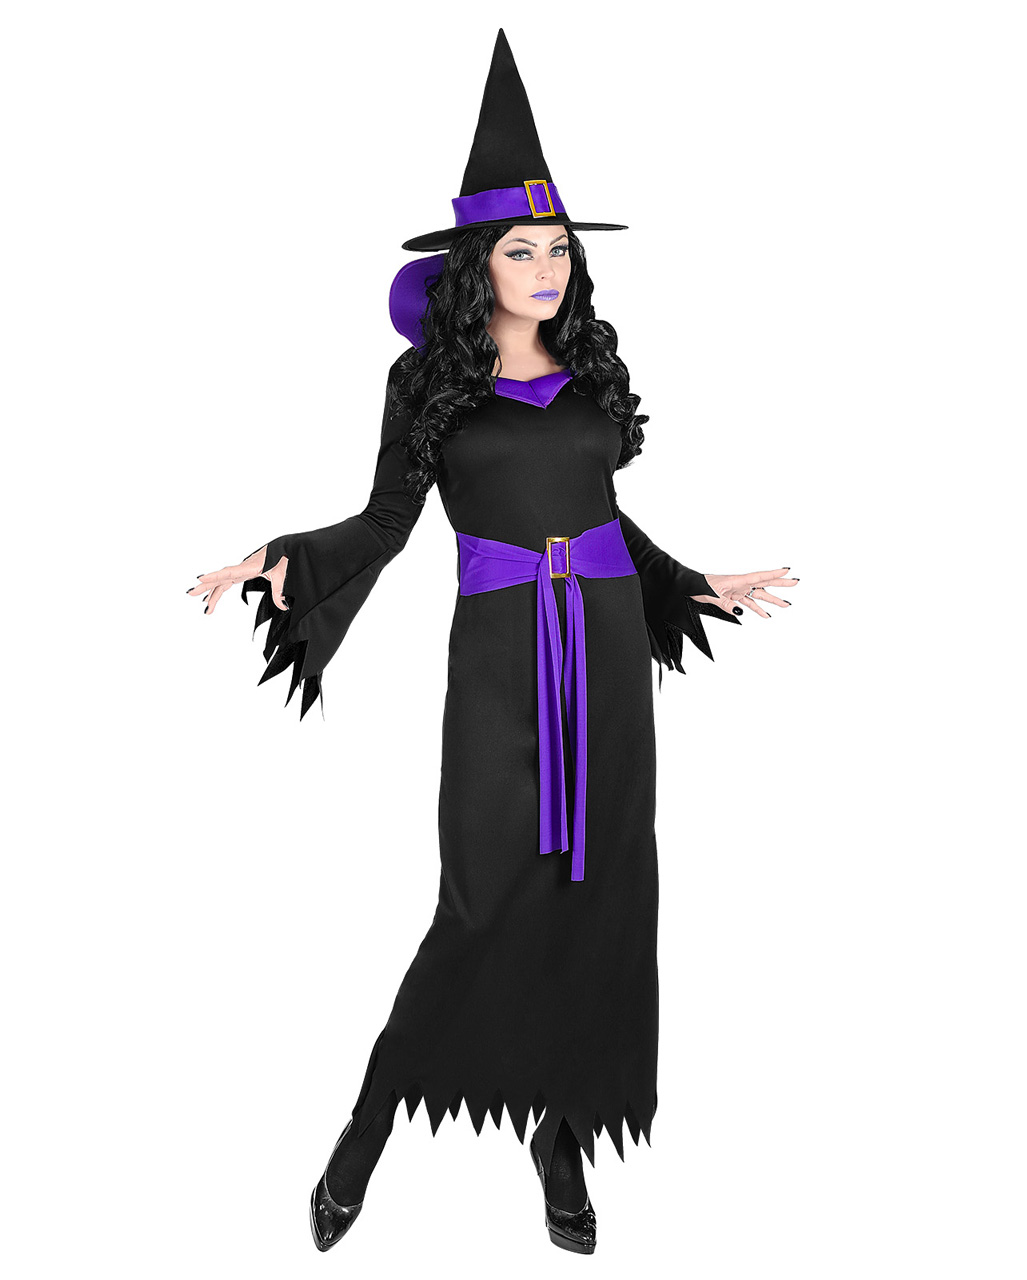 Victorian-vampire-deluxe kostuem-halloween-cladding-bloodsucker-graefin-victorian-vampire-costume-36242.jpg